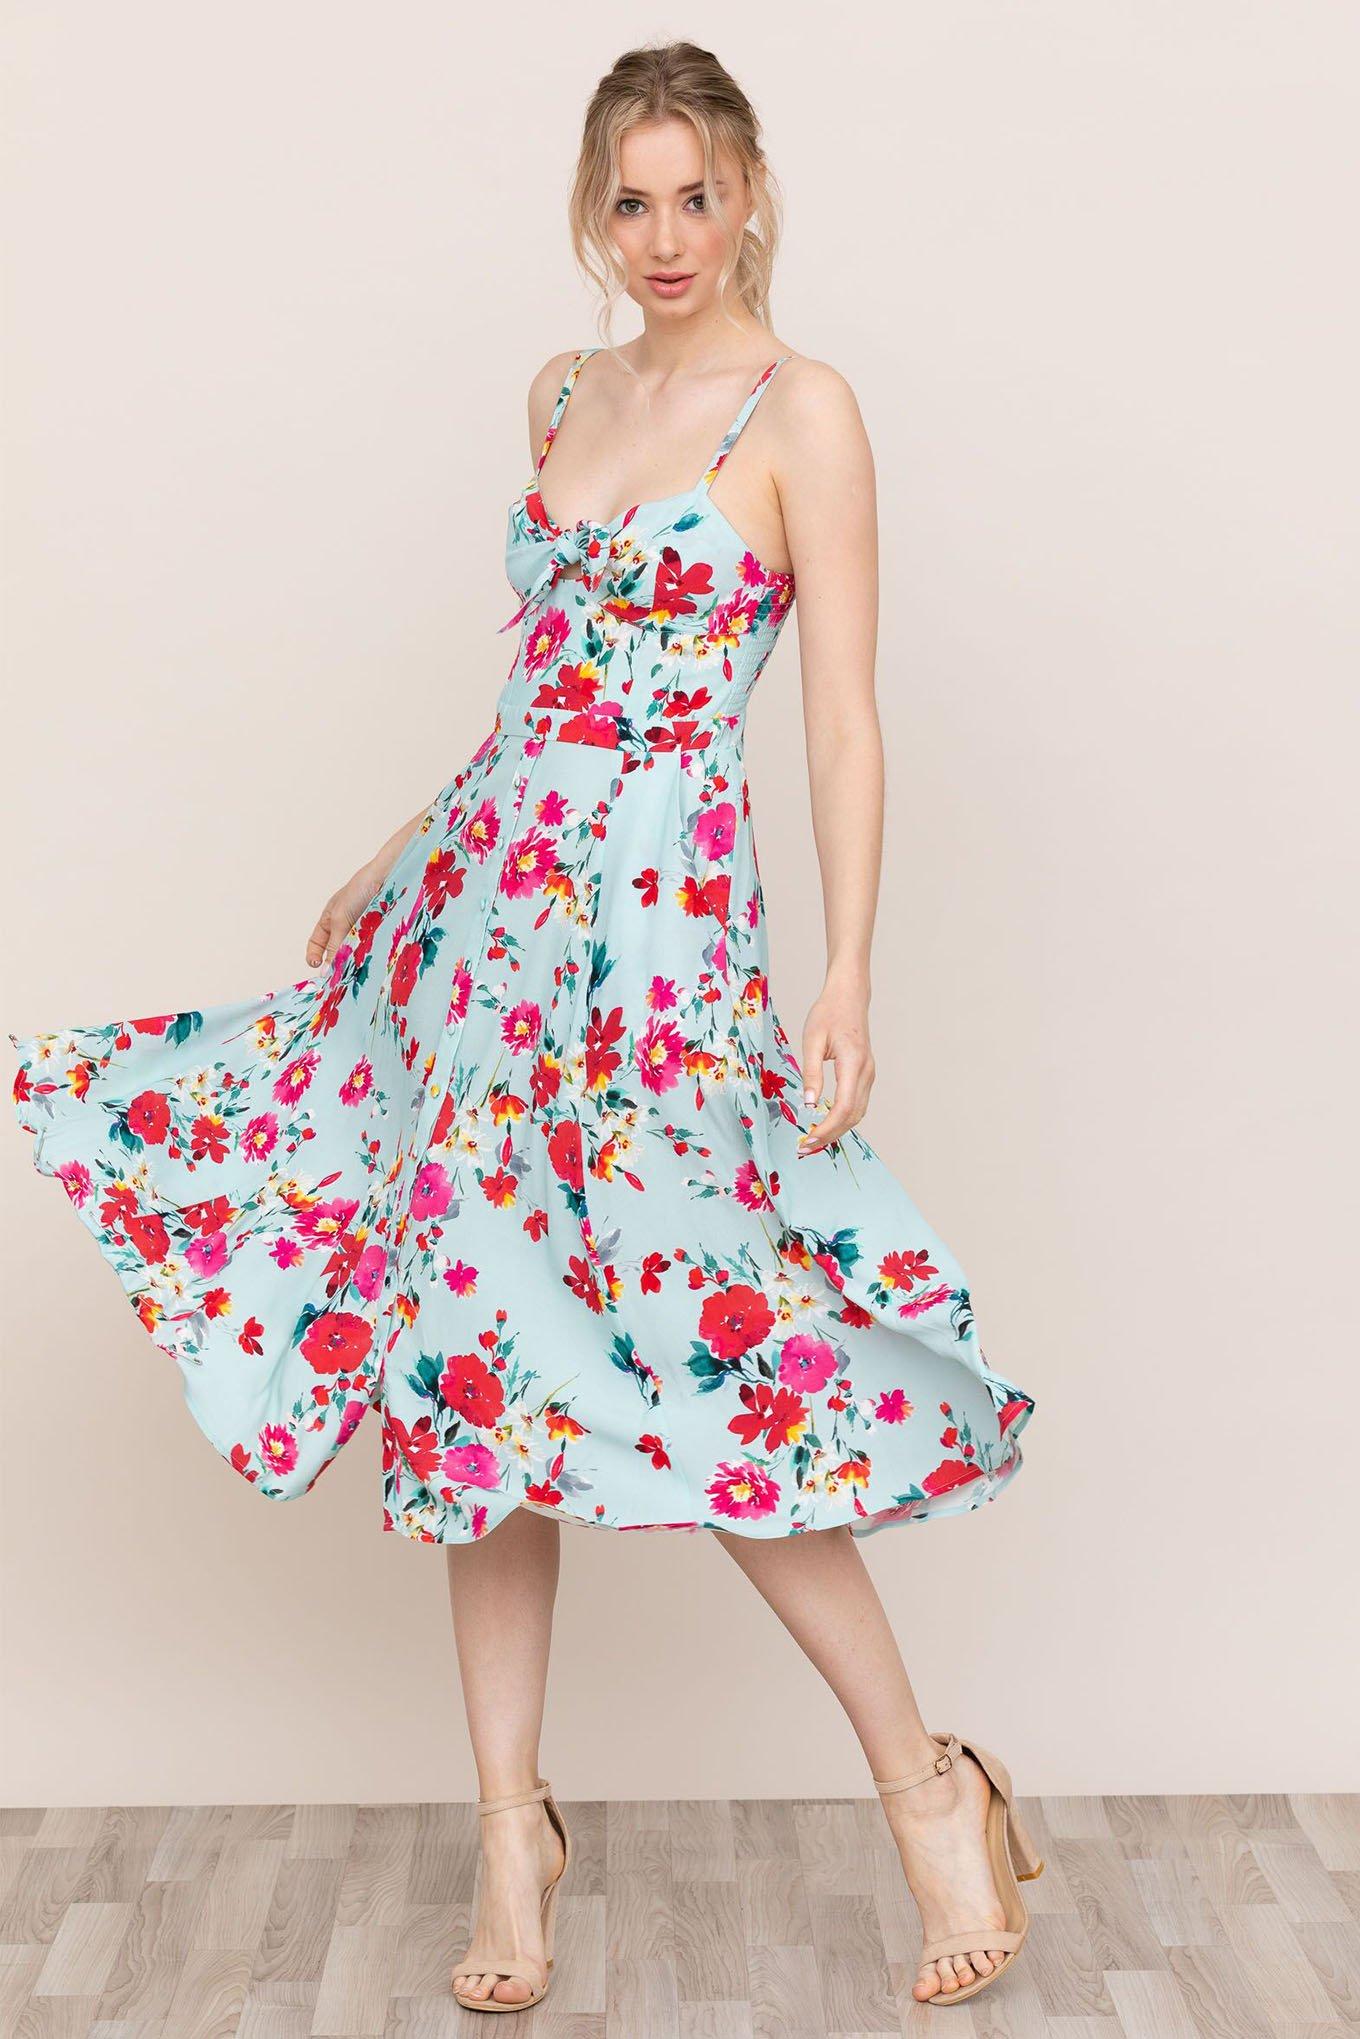 PRETTY WOMAN DRESS  Pretty women dresses, Dresses, Womens dresses